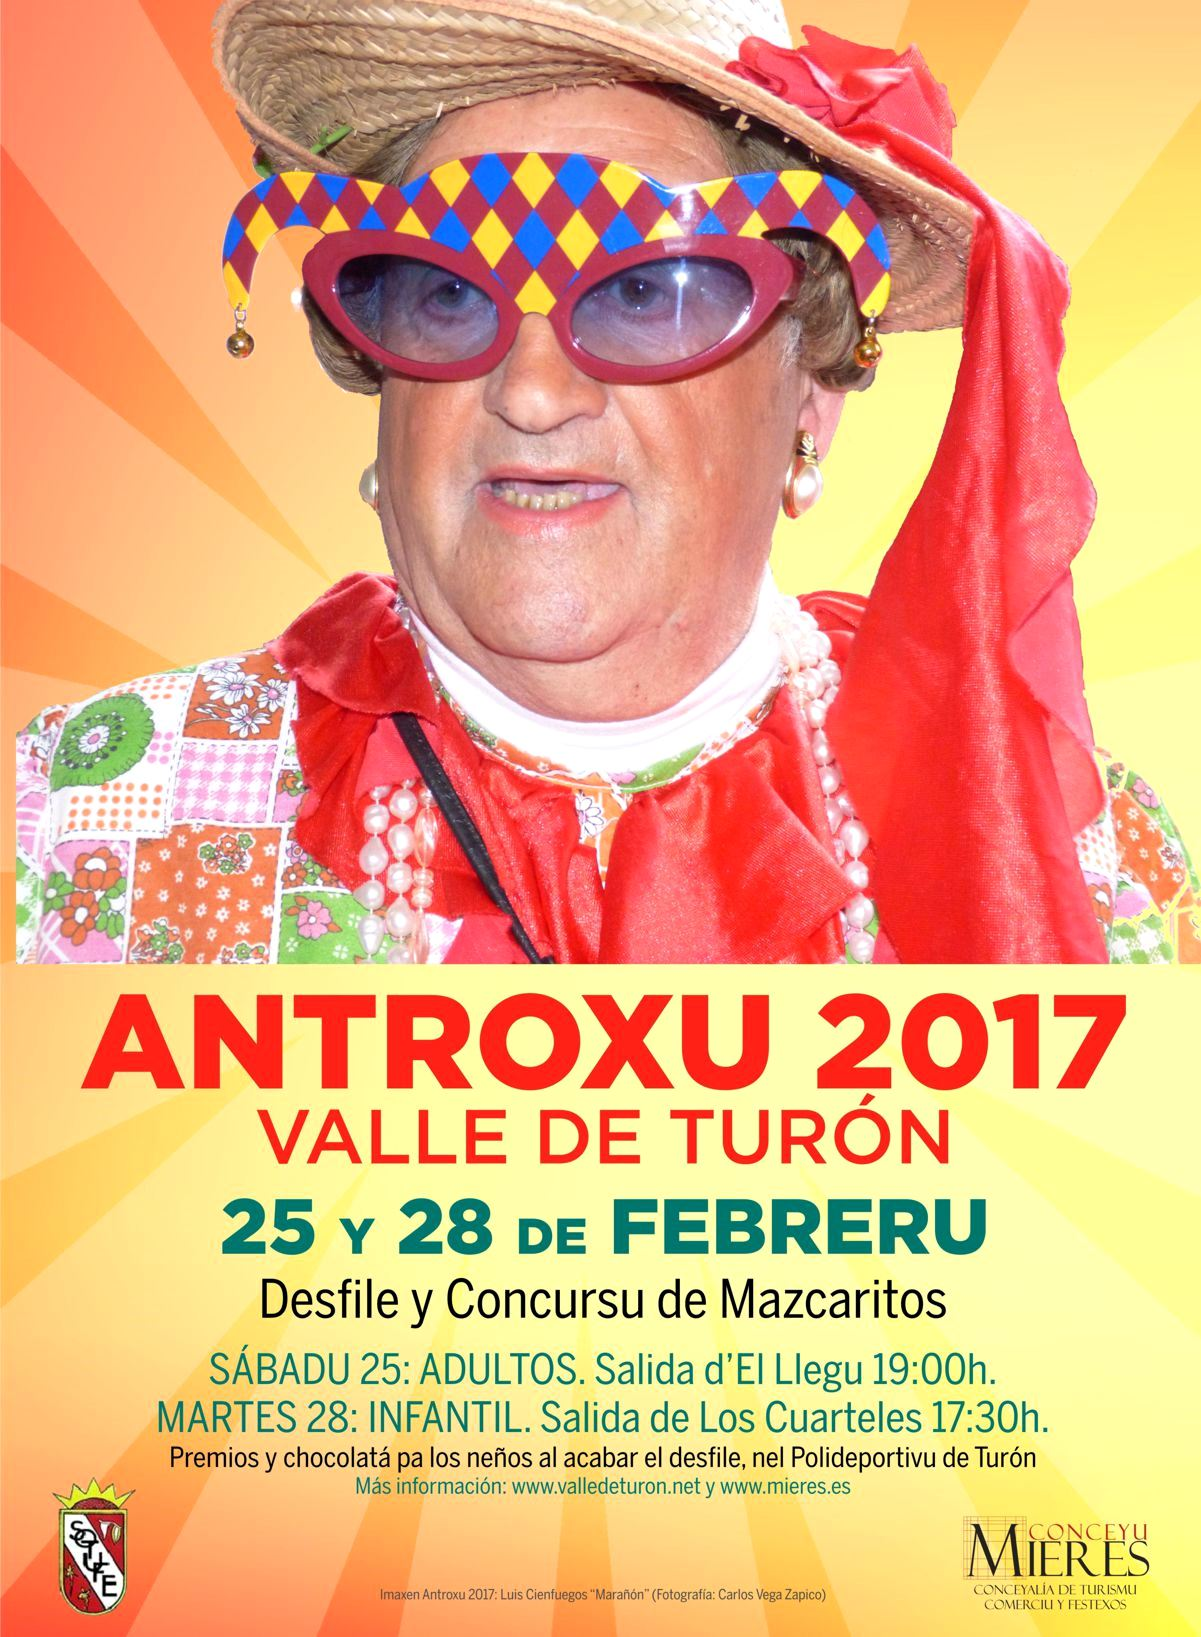 ANTROXU 2017 TURON Cartel web